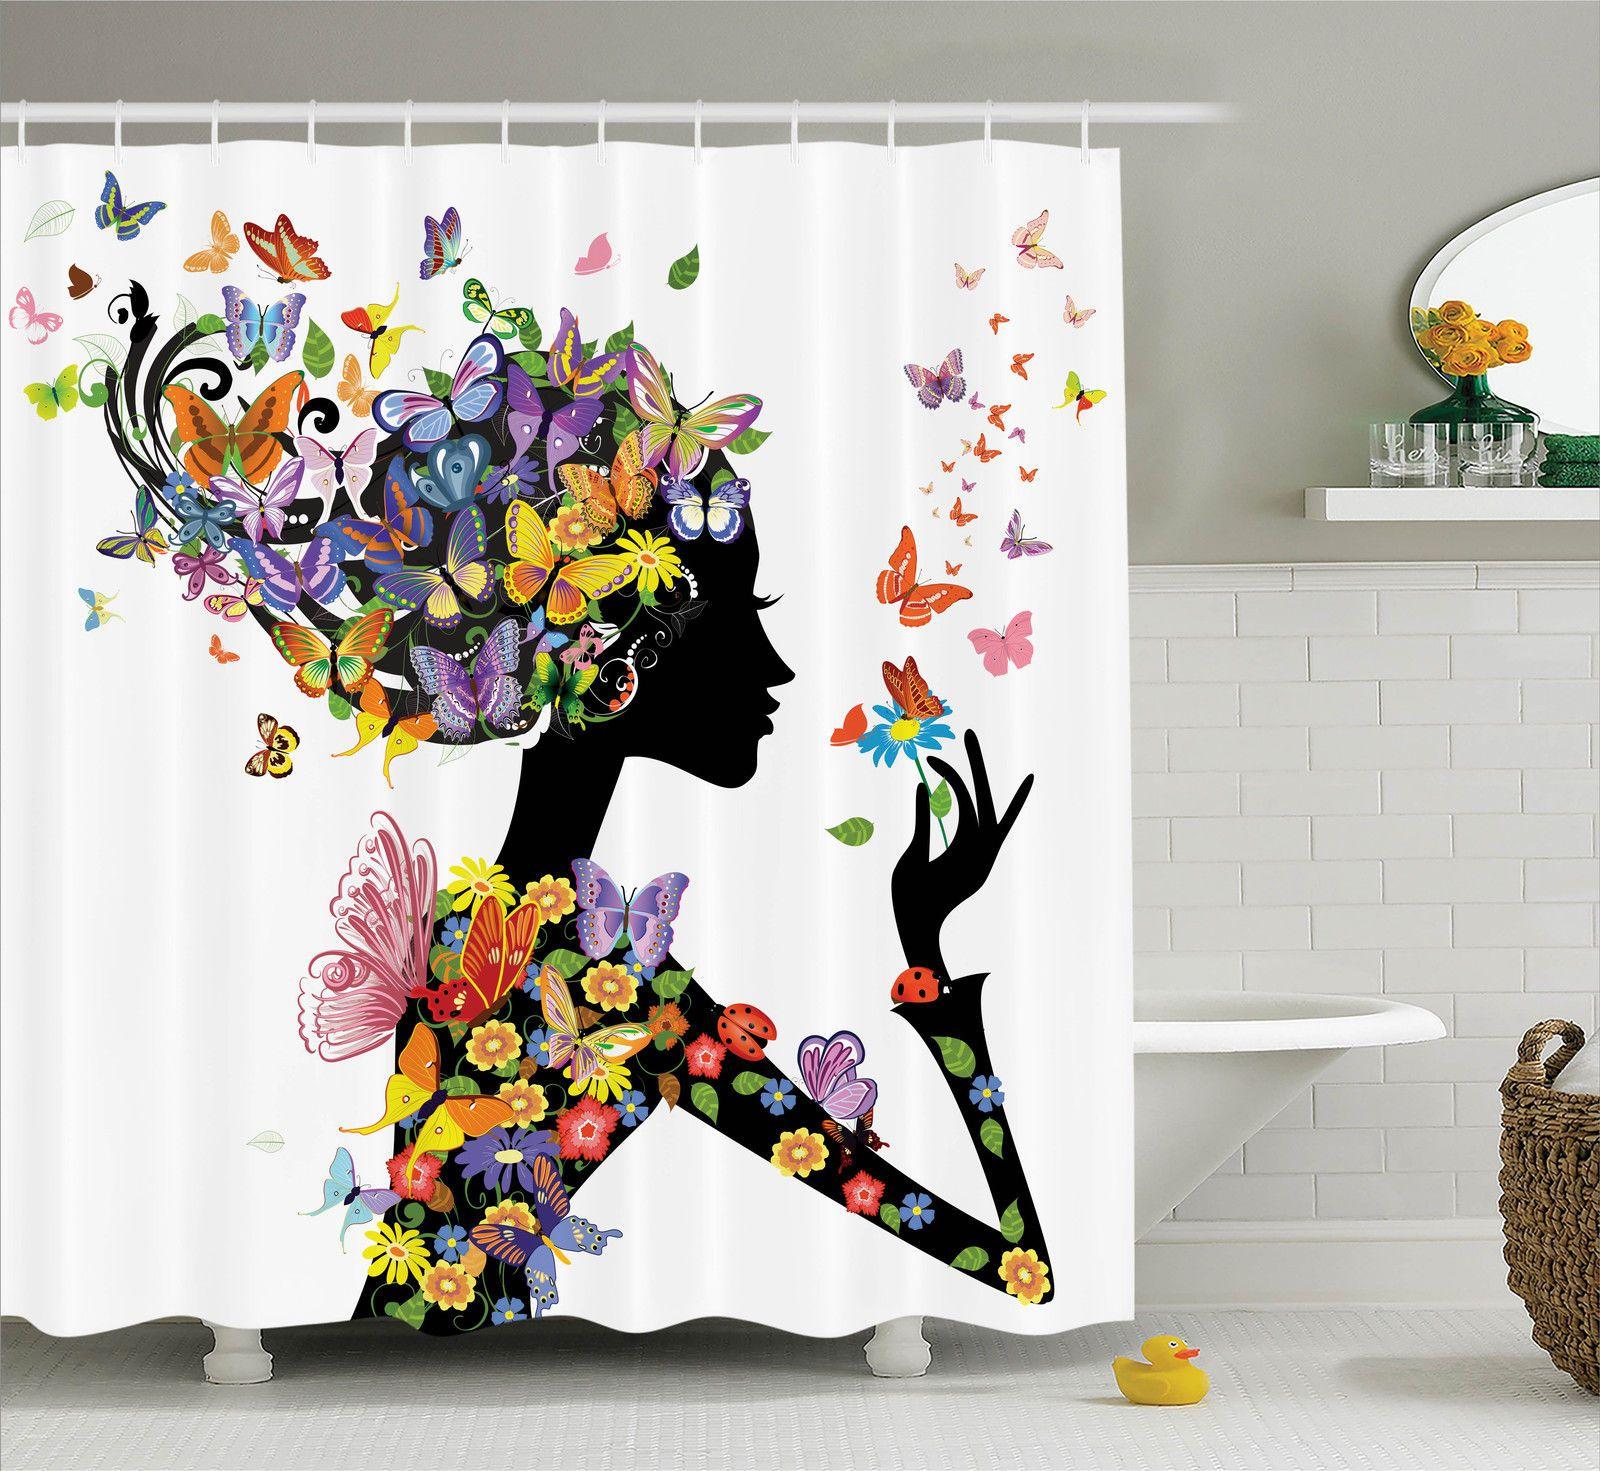 Butterflies Decoration Shower Curtain Set, Girl Fashion Flowers